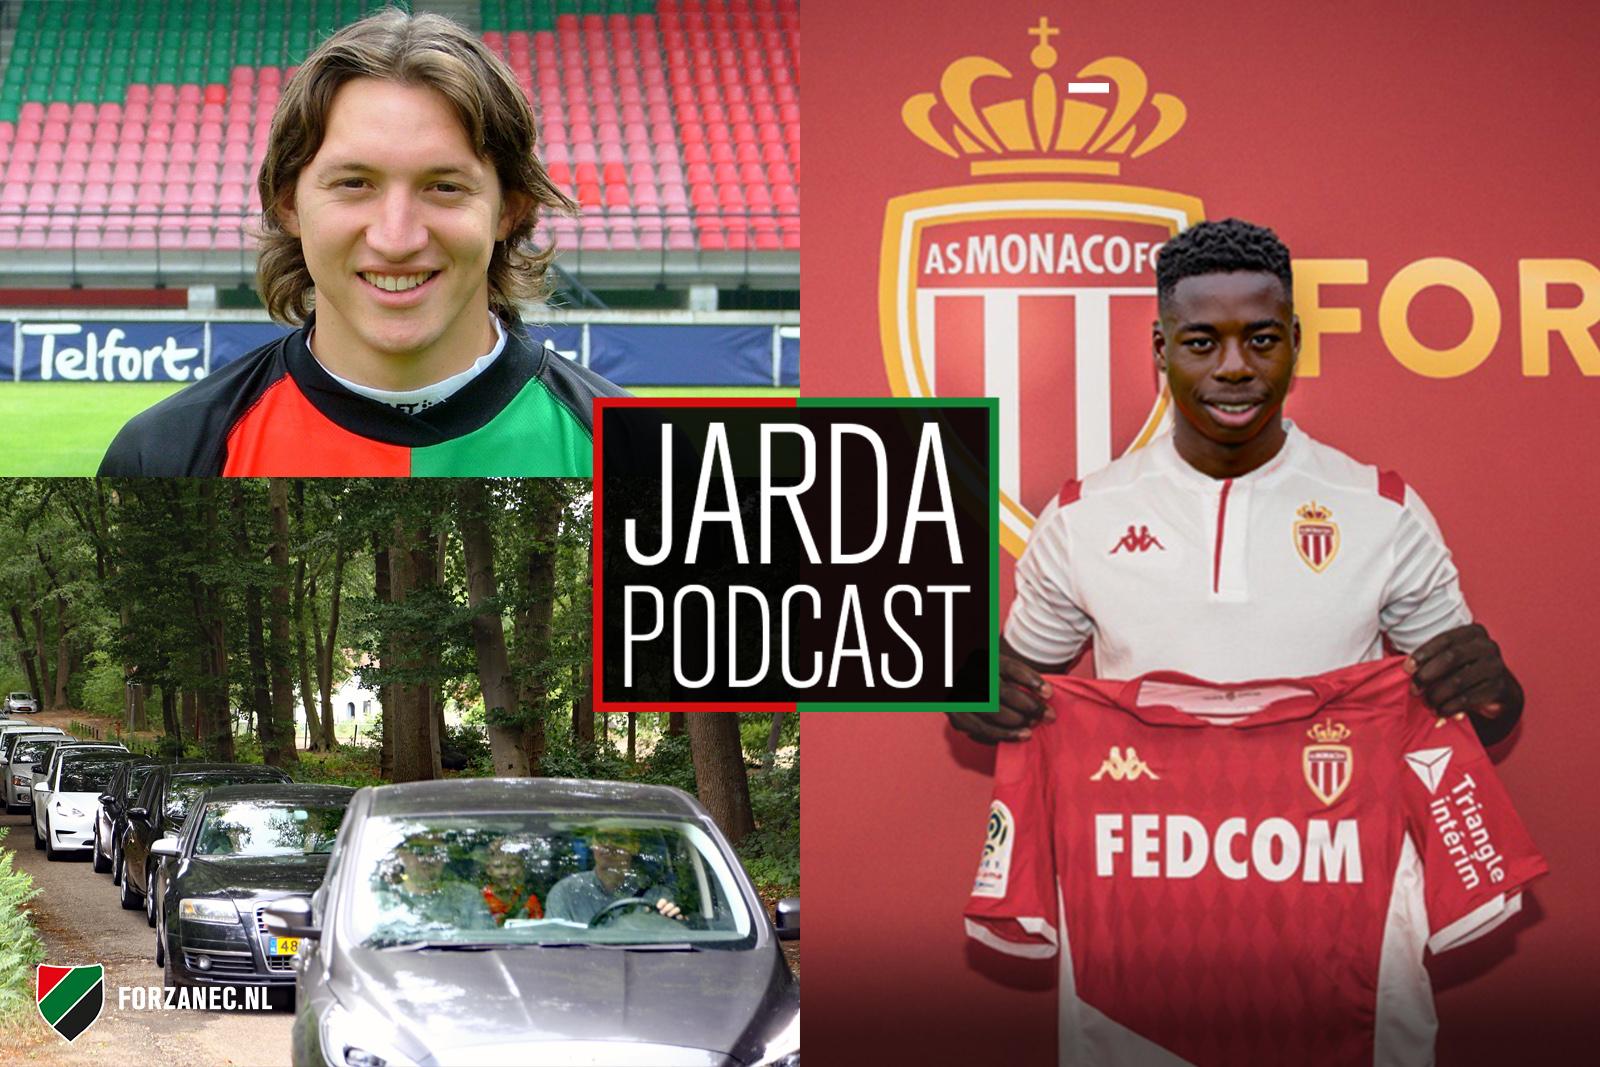 Jarda Podcast #43: Over de Deur Rij Mert, Musaba, Tavsan en Barreto